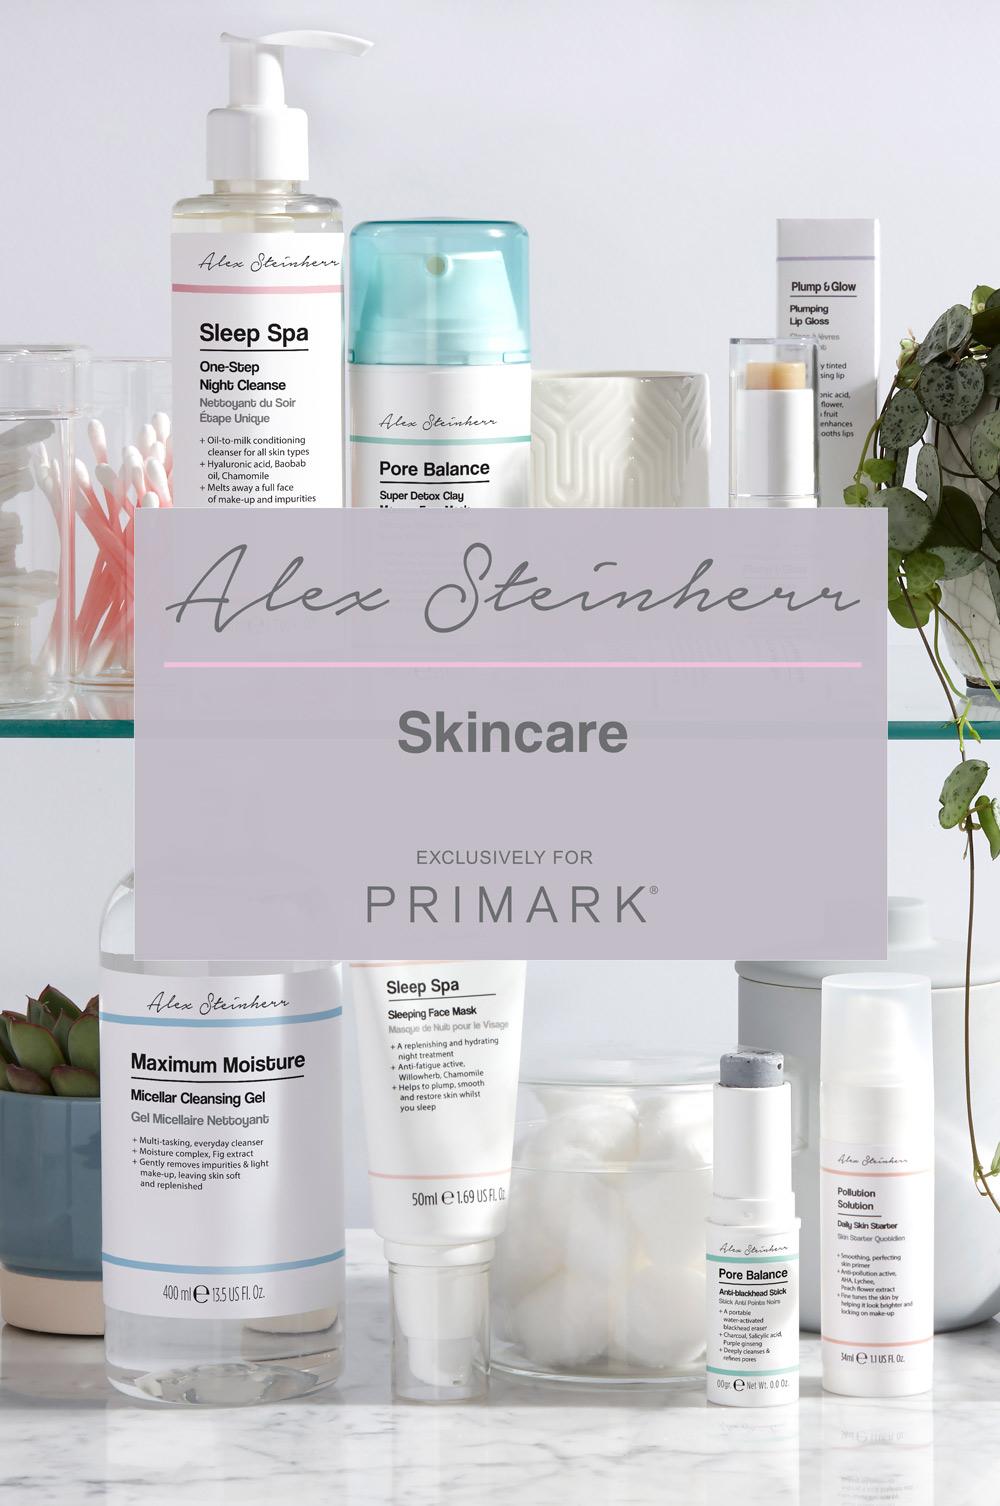 Primark-Alessandra-Steinherr-Skincare-Collection-Image-Text-Image-4.jpg